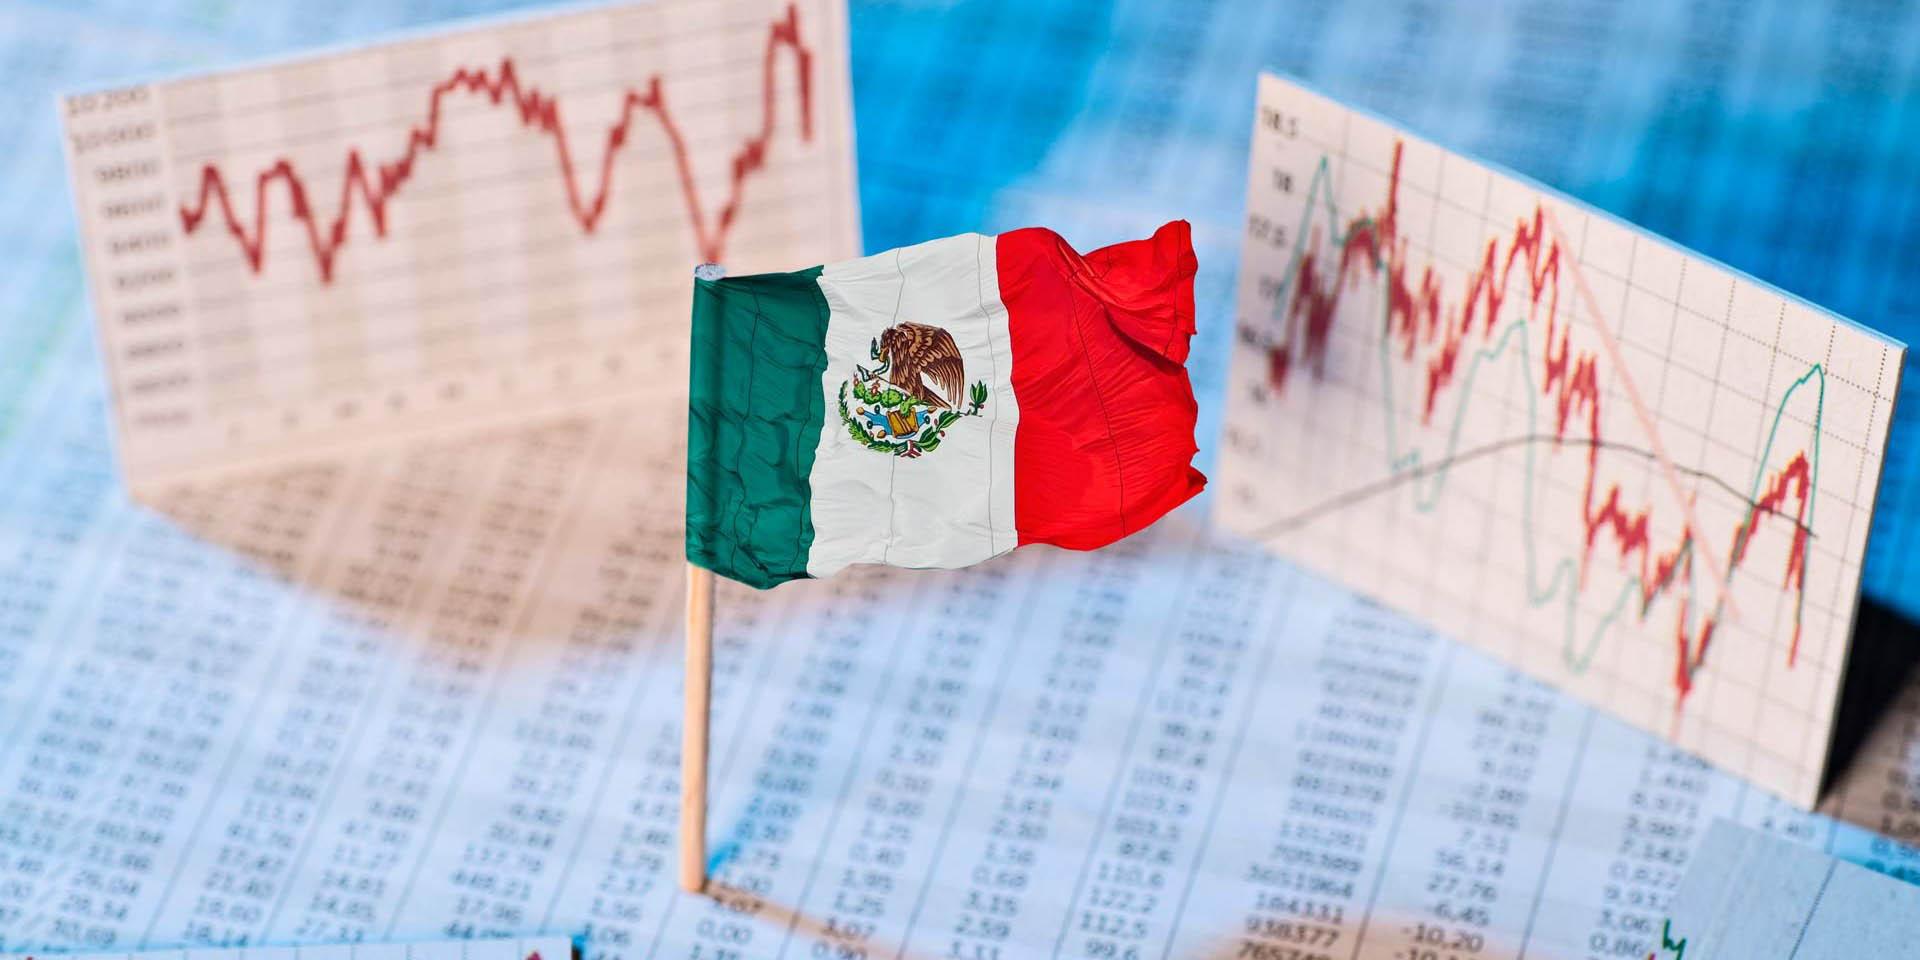 Pese a pandemia, economía mexicana se acelera; tasa anual crece un 19.6%   El Imparcial de Oaxaca